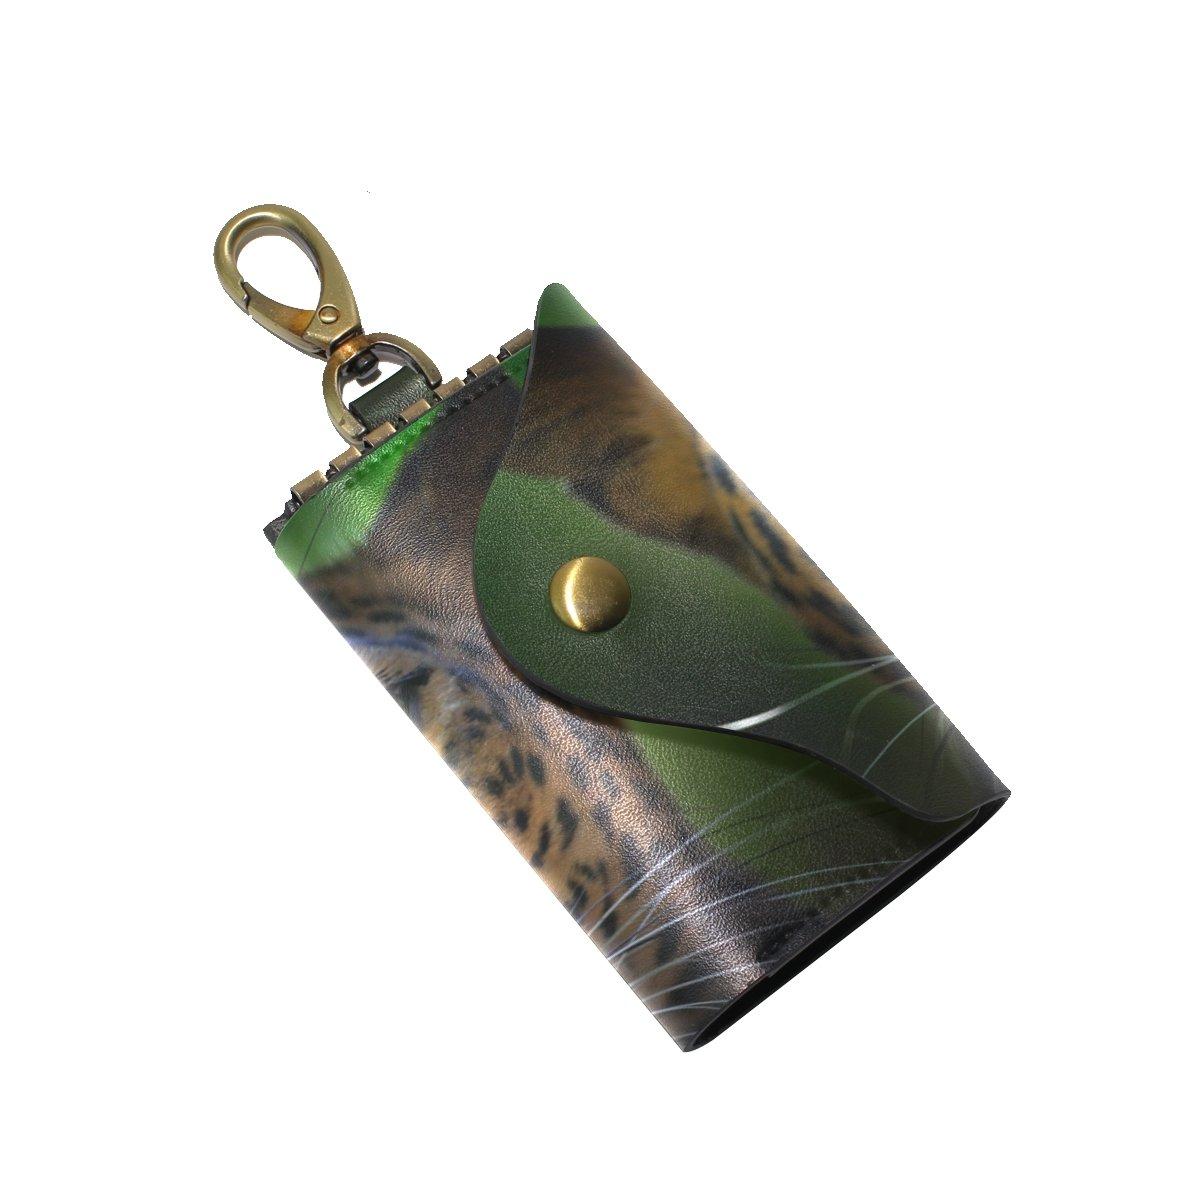 KEAKIA Wild Cat Leopard Leather Key Case Wallets Tri-fold Key Holder Keychains with 6 Hooks 2 Slot Snap Closure for Men Women